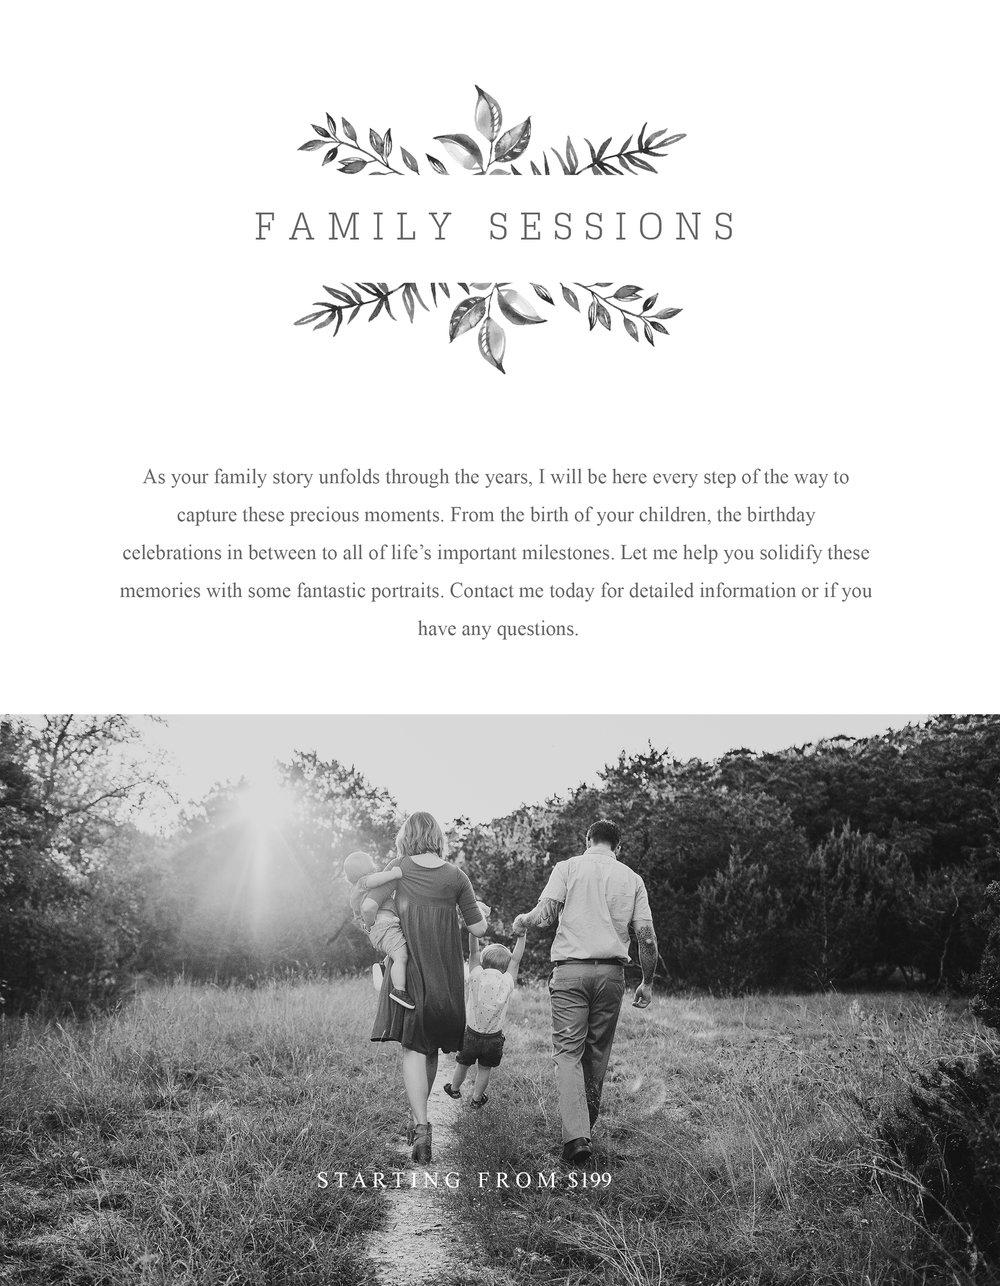 4-FamilySessionedit.jpg